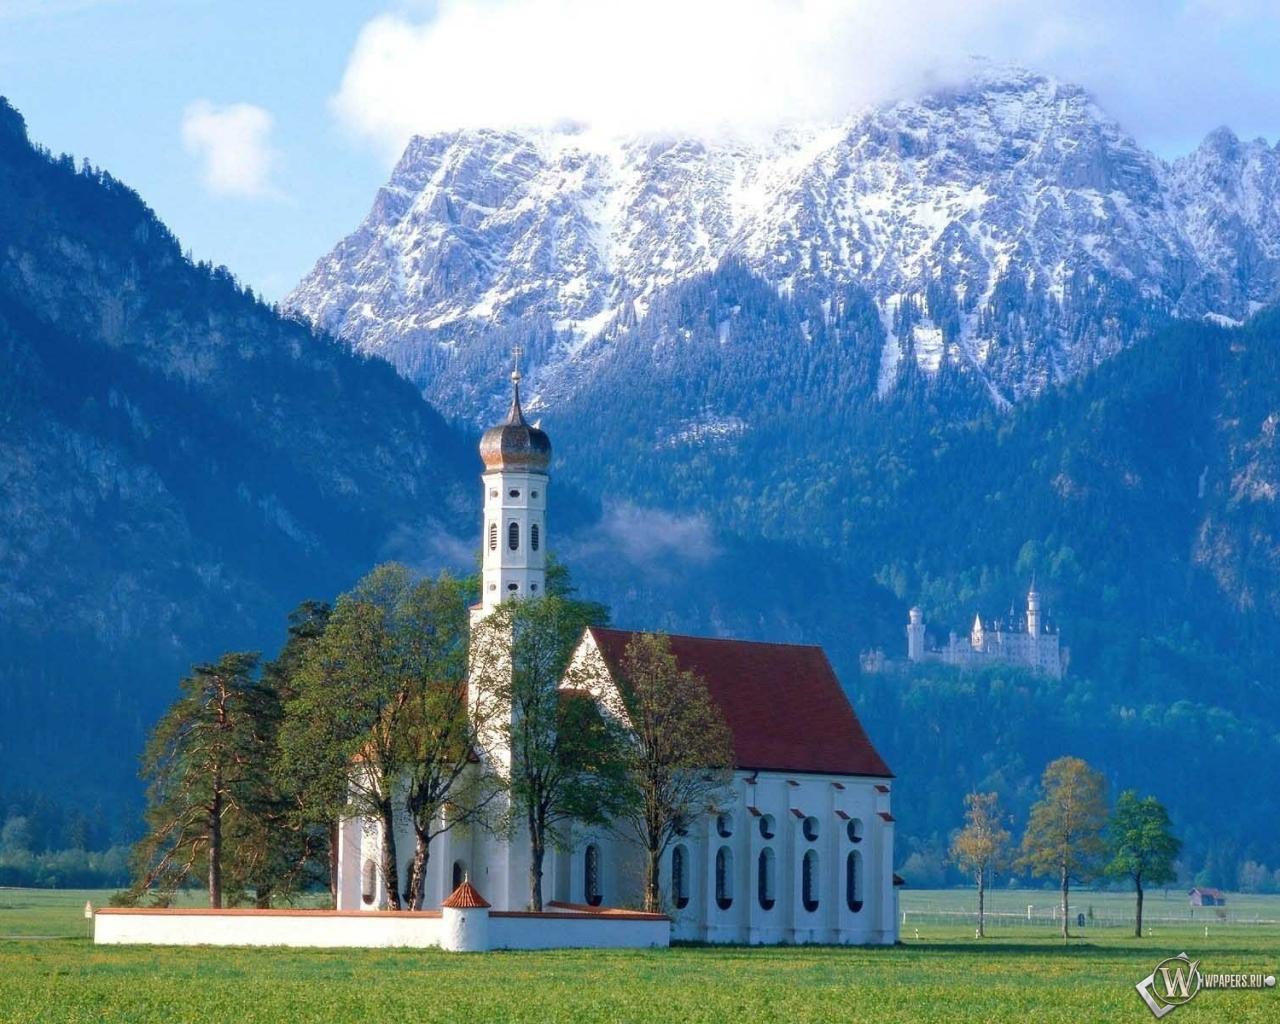 Церковь в Баварии Германия 1280x1024